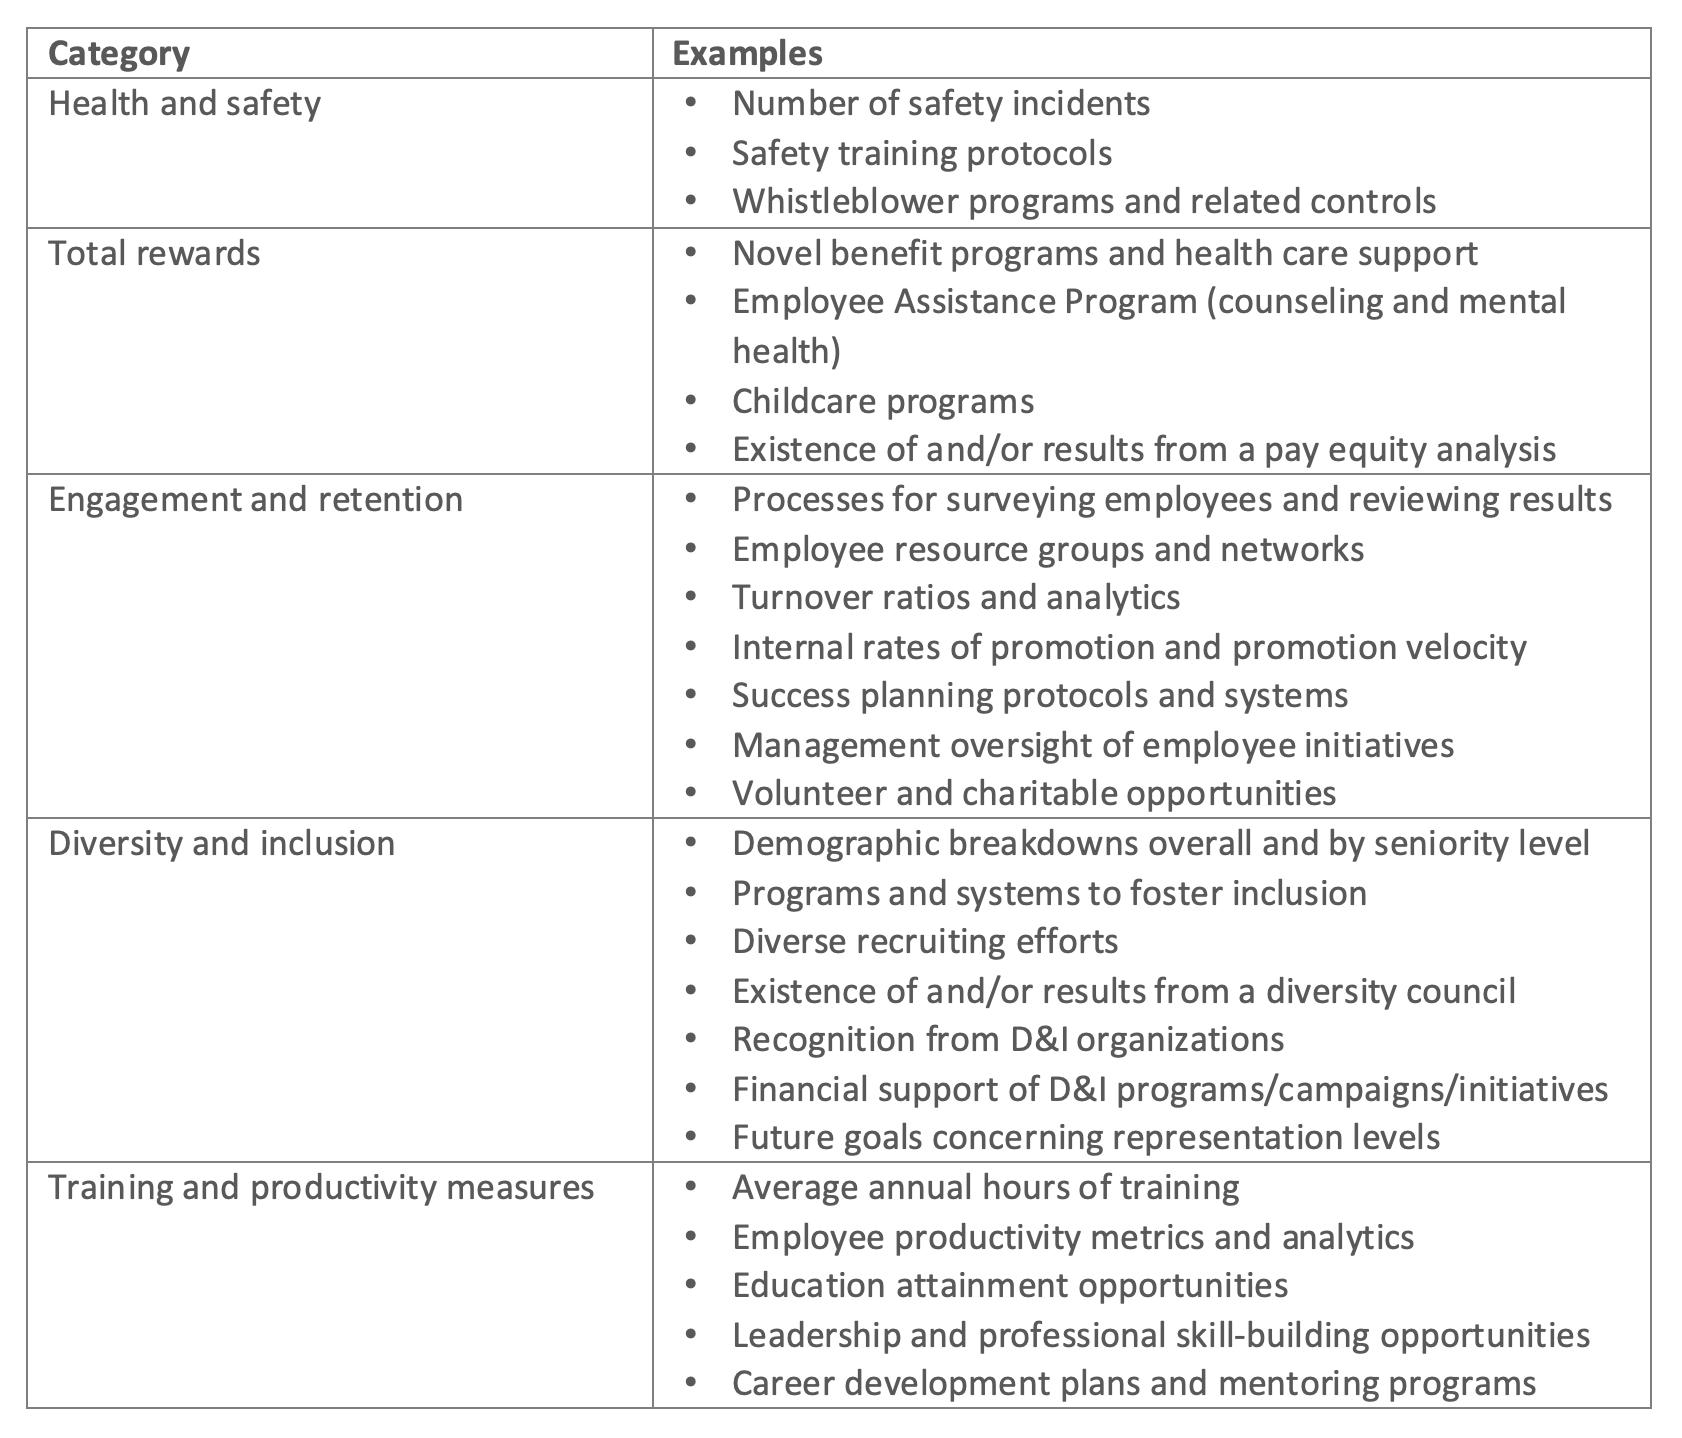 Human Capital Strategy 10-K Disclosure Categories